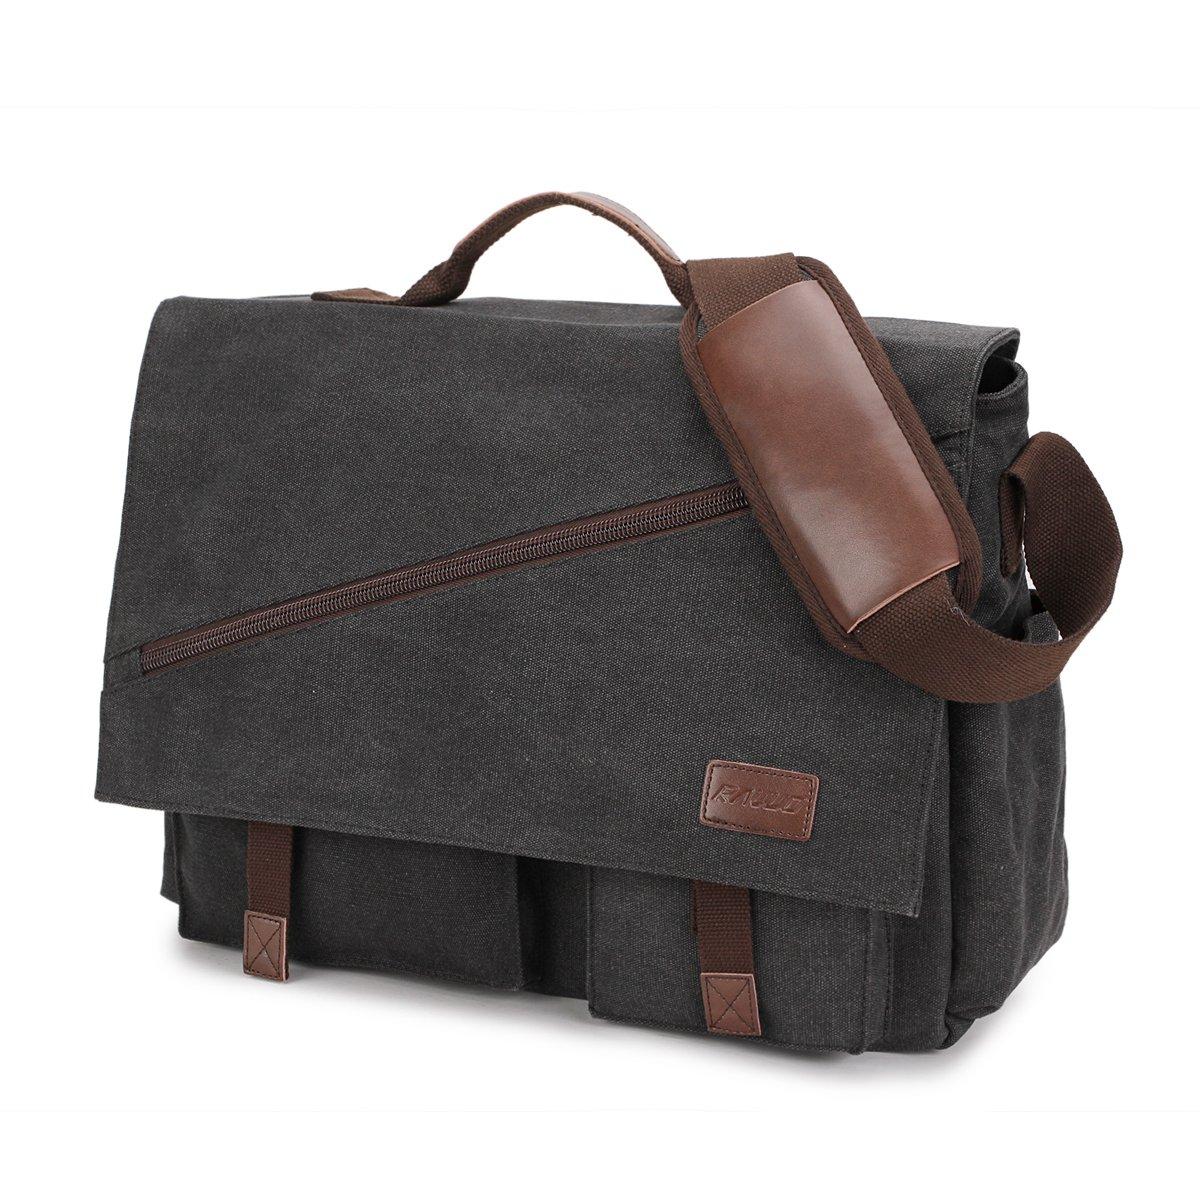 Mens Messenger Bag,17.3 Inch Water Resistant Canvas Satchel Large Black Vintage Shoulder Business Briefcase Bookbag by RAVUO by RAVUO